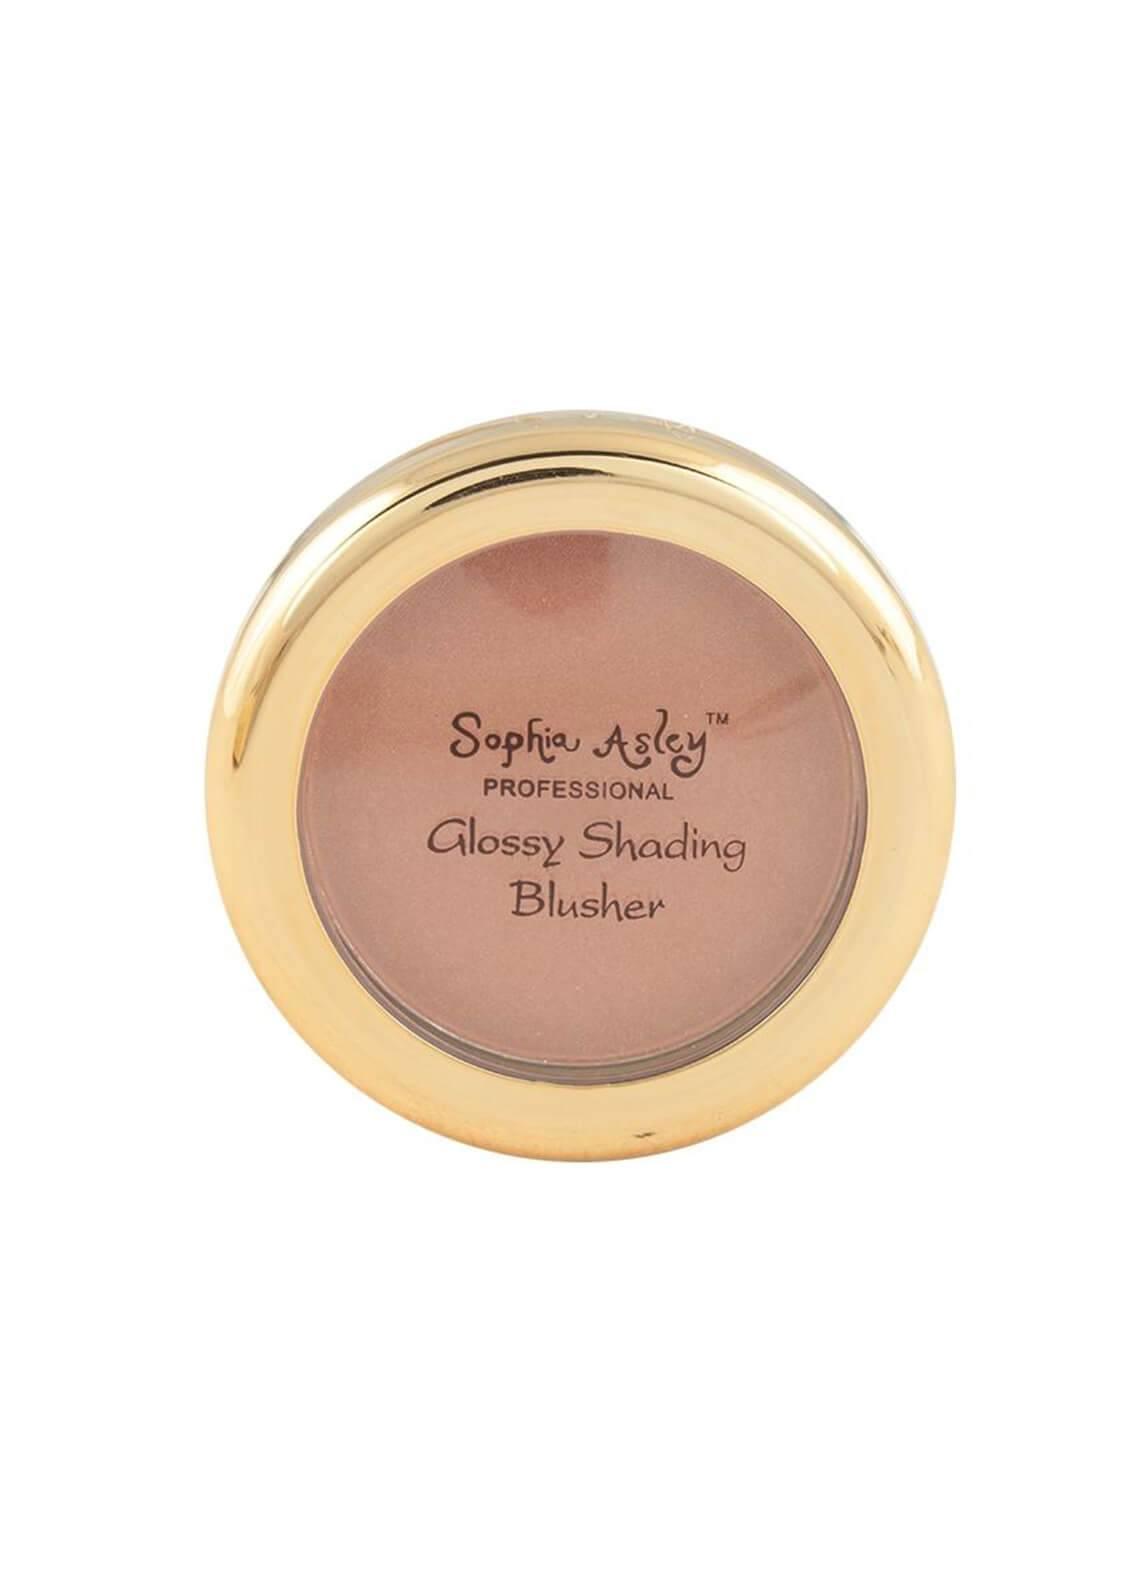 Sophia Asley Glossy Shading Blusher - 8   Tender Love